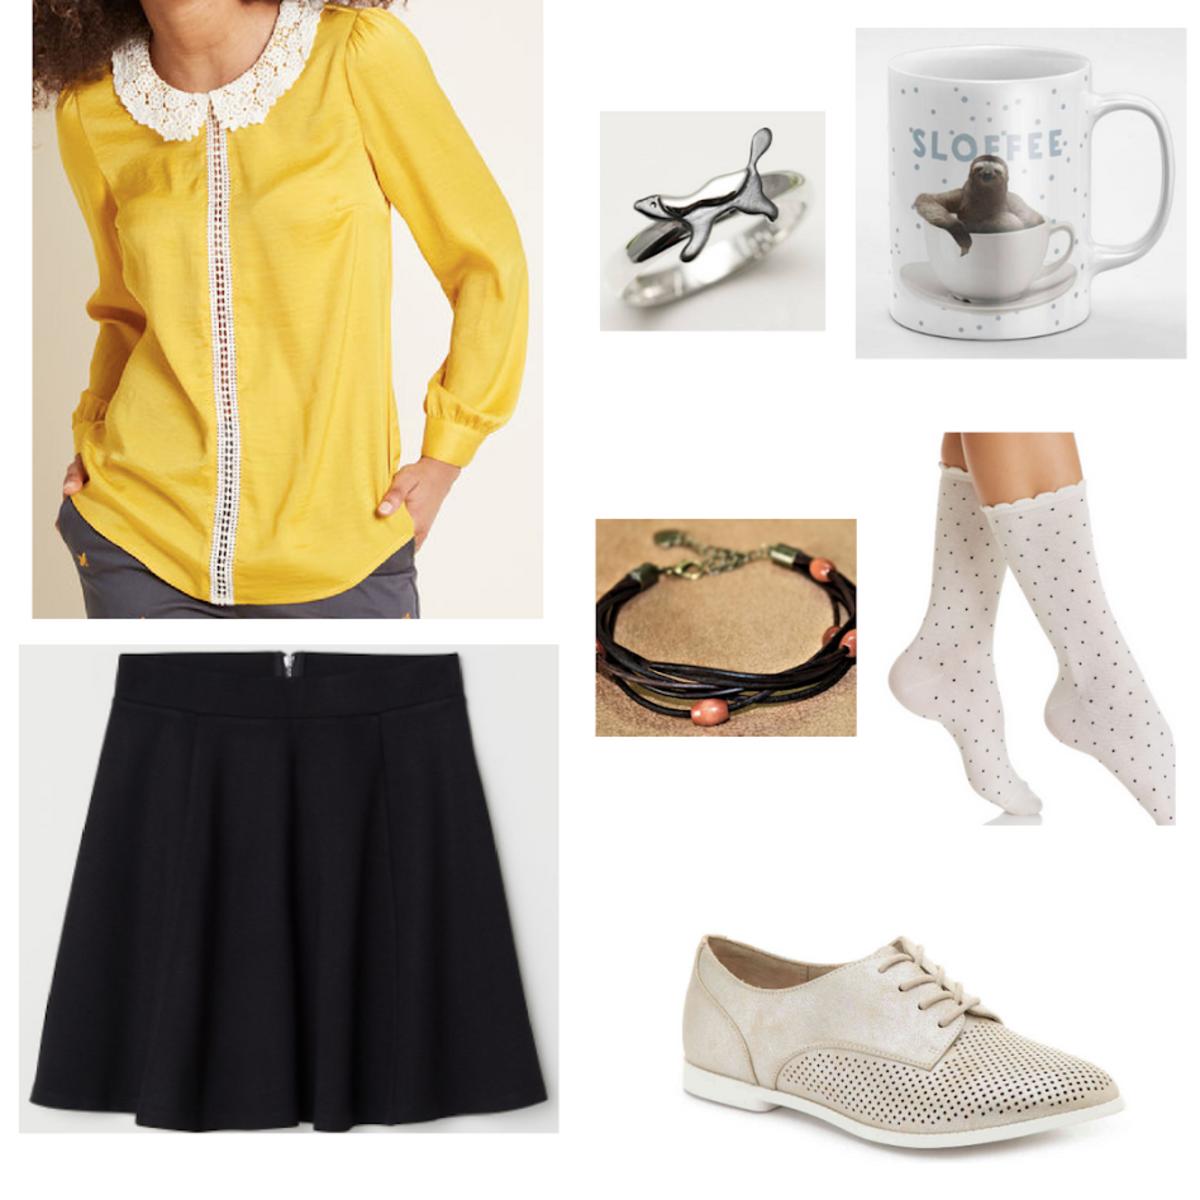 c20b83f4665b Fashion Inspired by the Hogwarts Houses - Hufflepuff